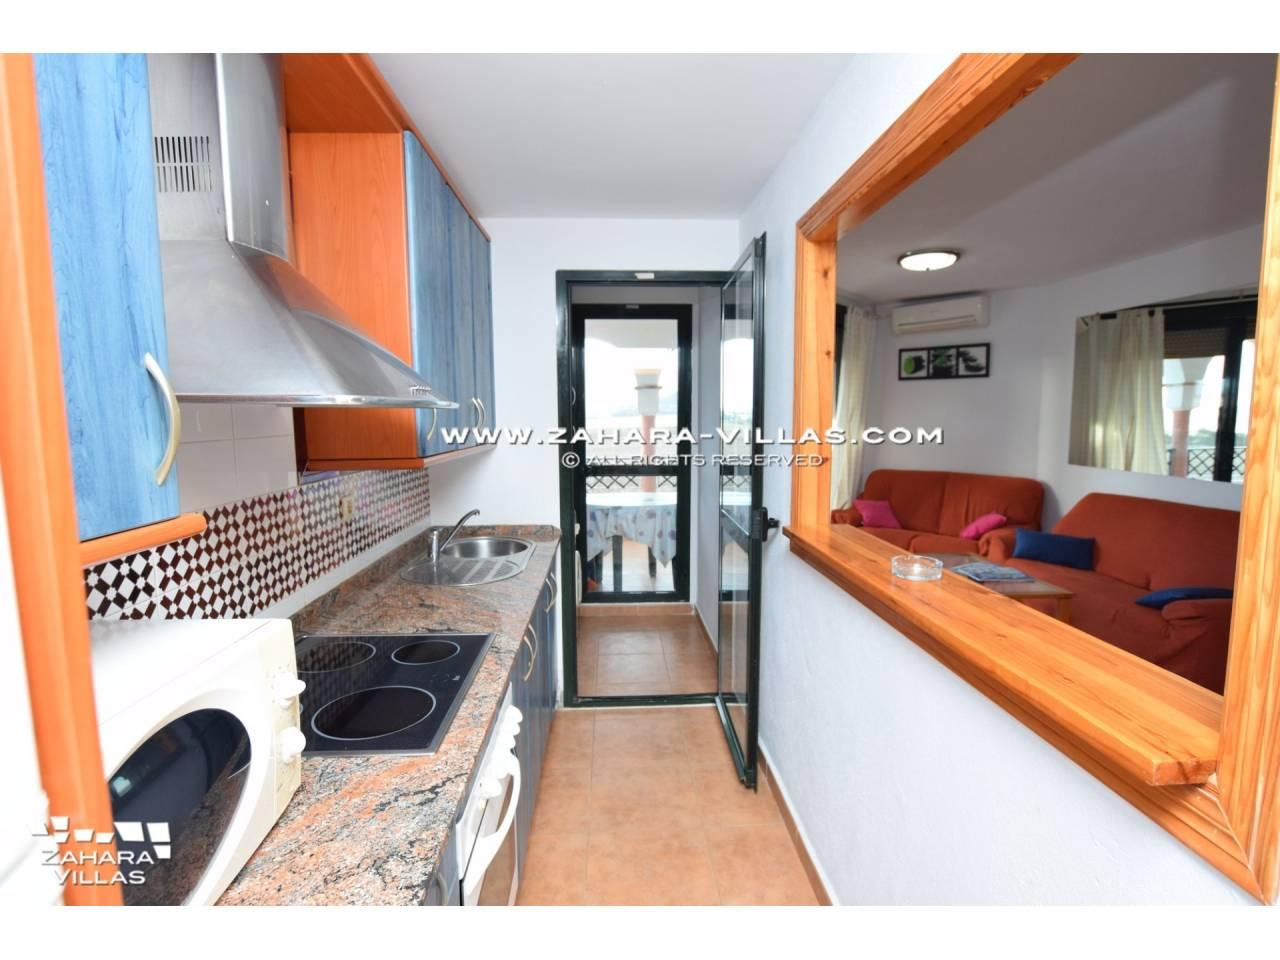 Imagen 6 de Penthouse for sale in Zahara de los Atunes